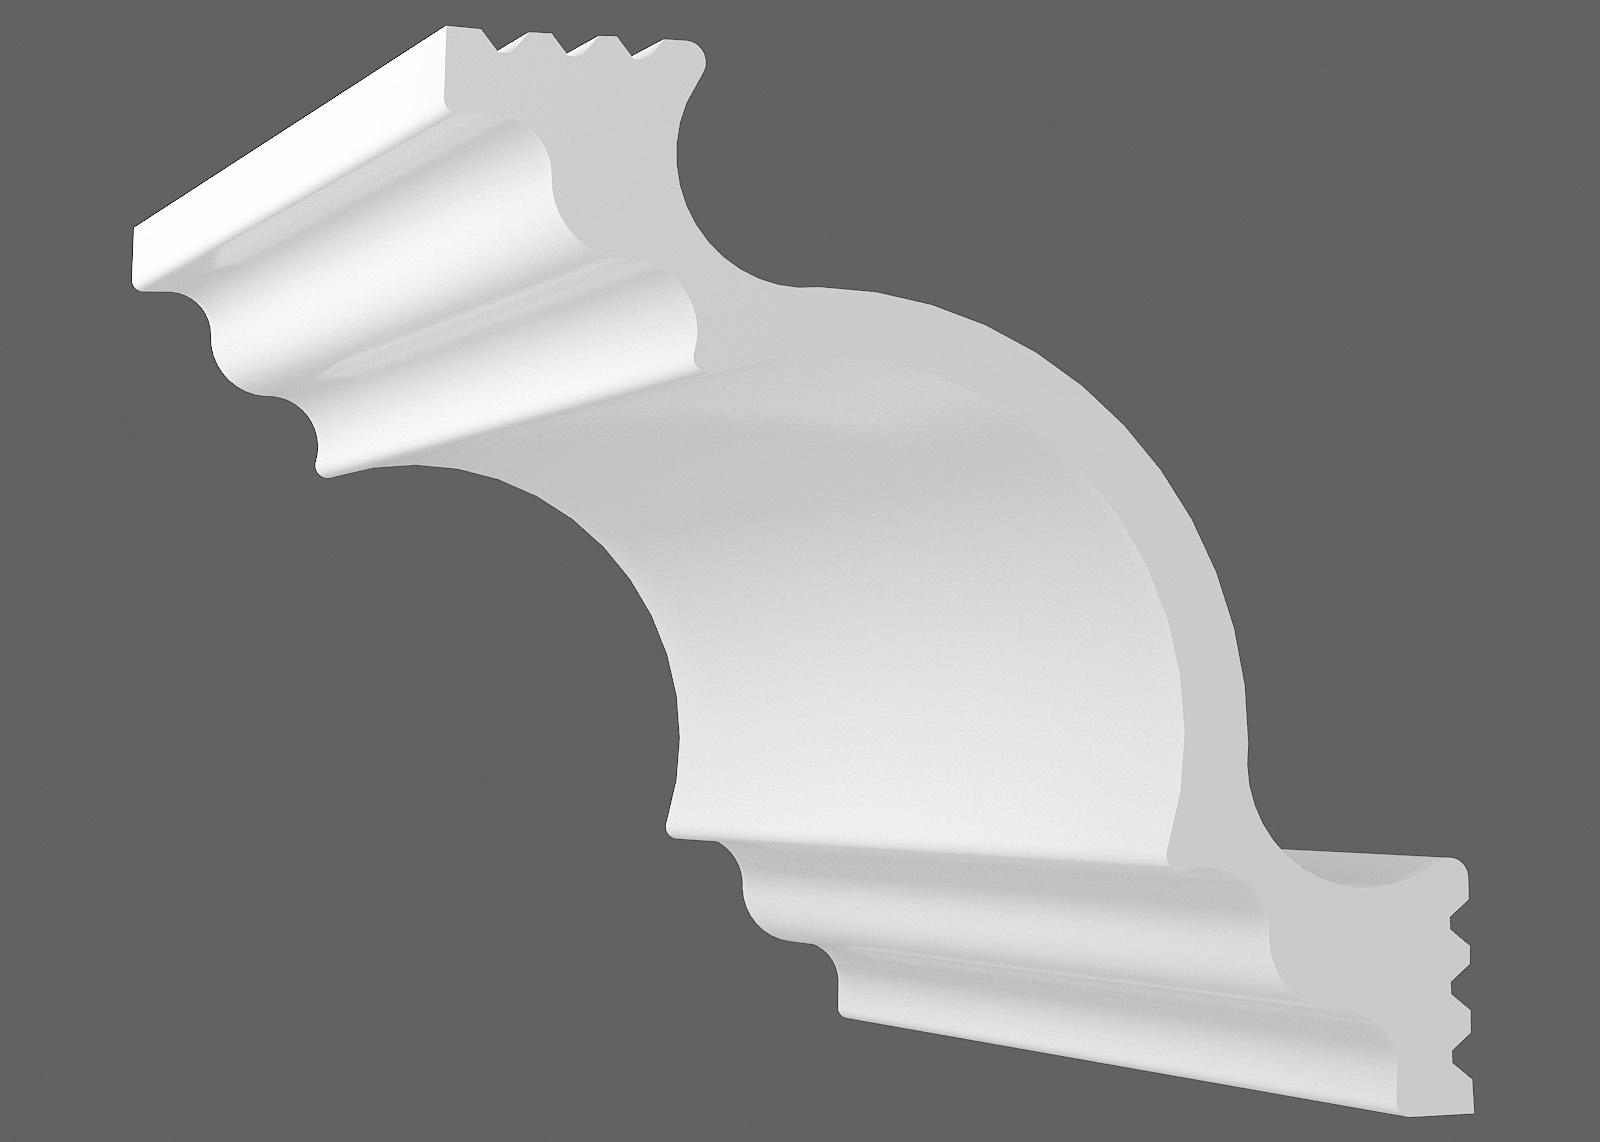 Потолочный плинтус К-150 (Размер:105х105мм)